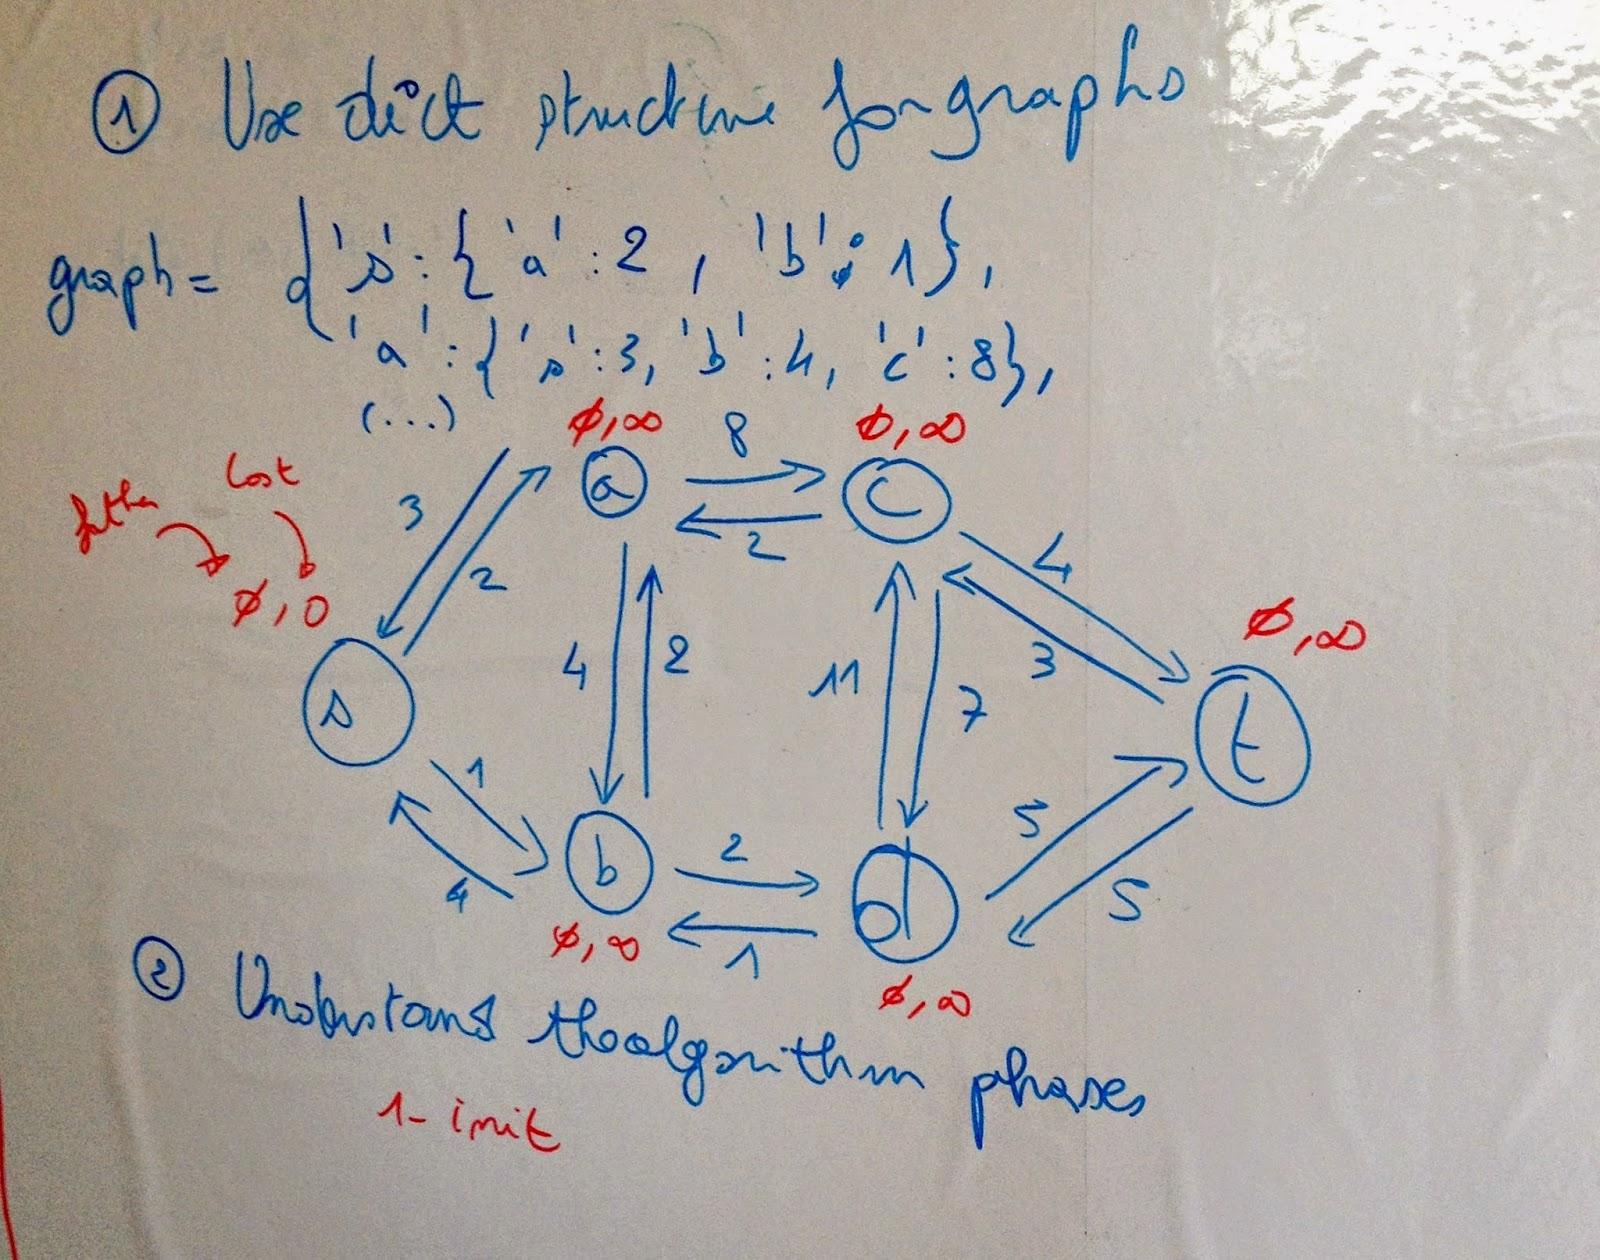 Dijkstra routing algorithm: How it calculates a shortest